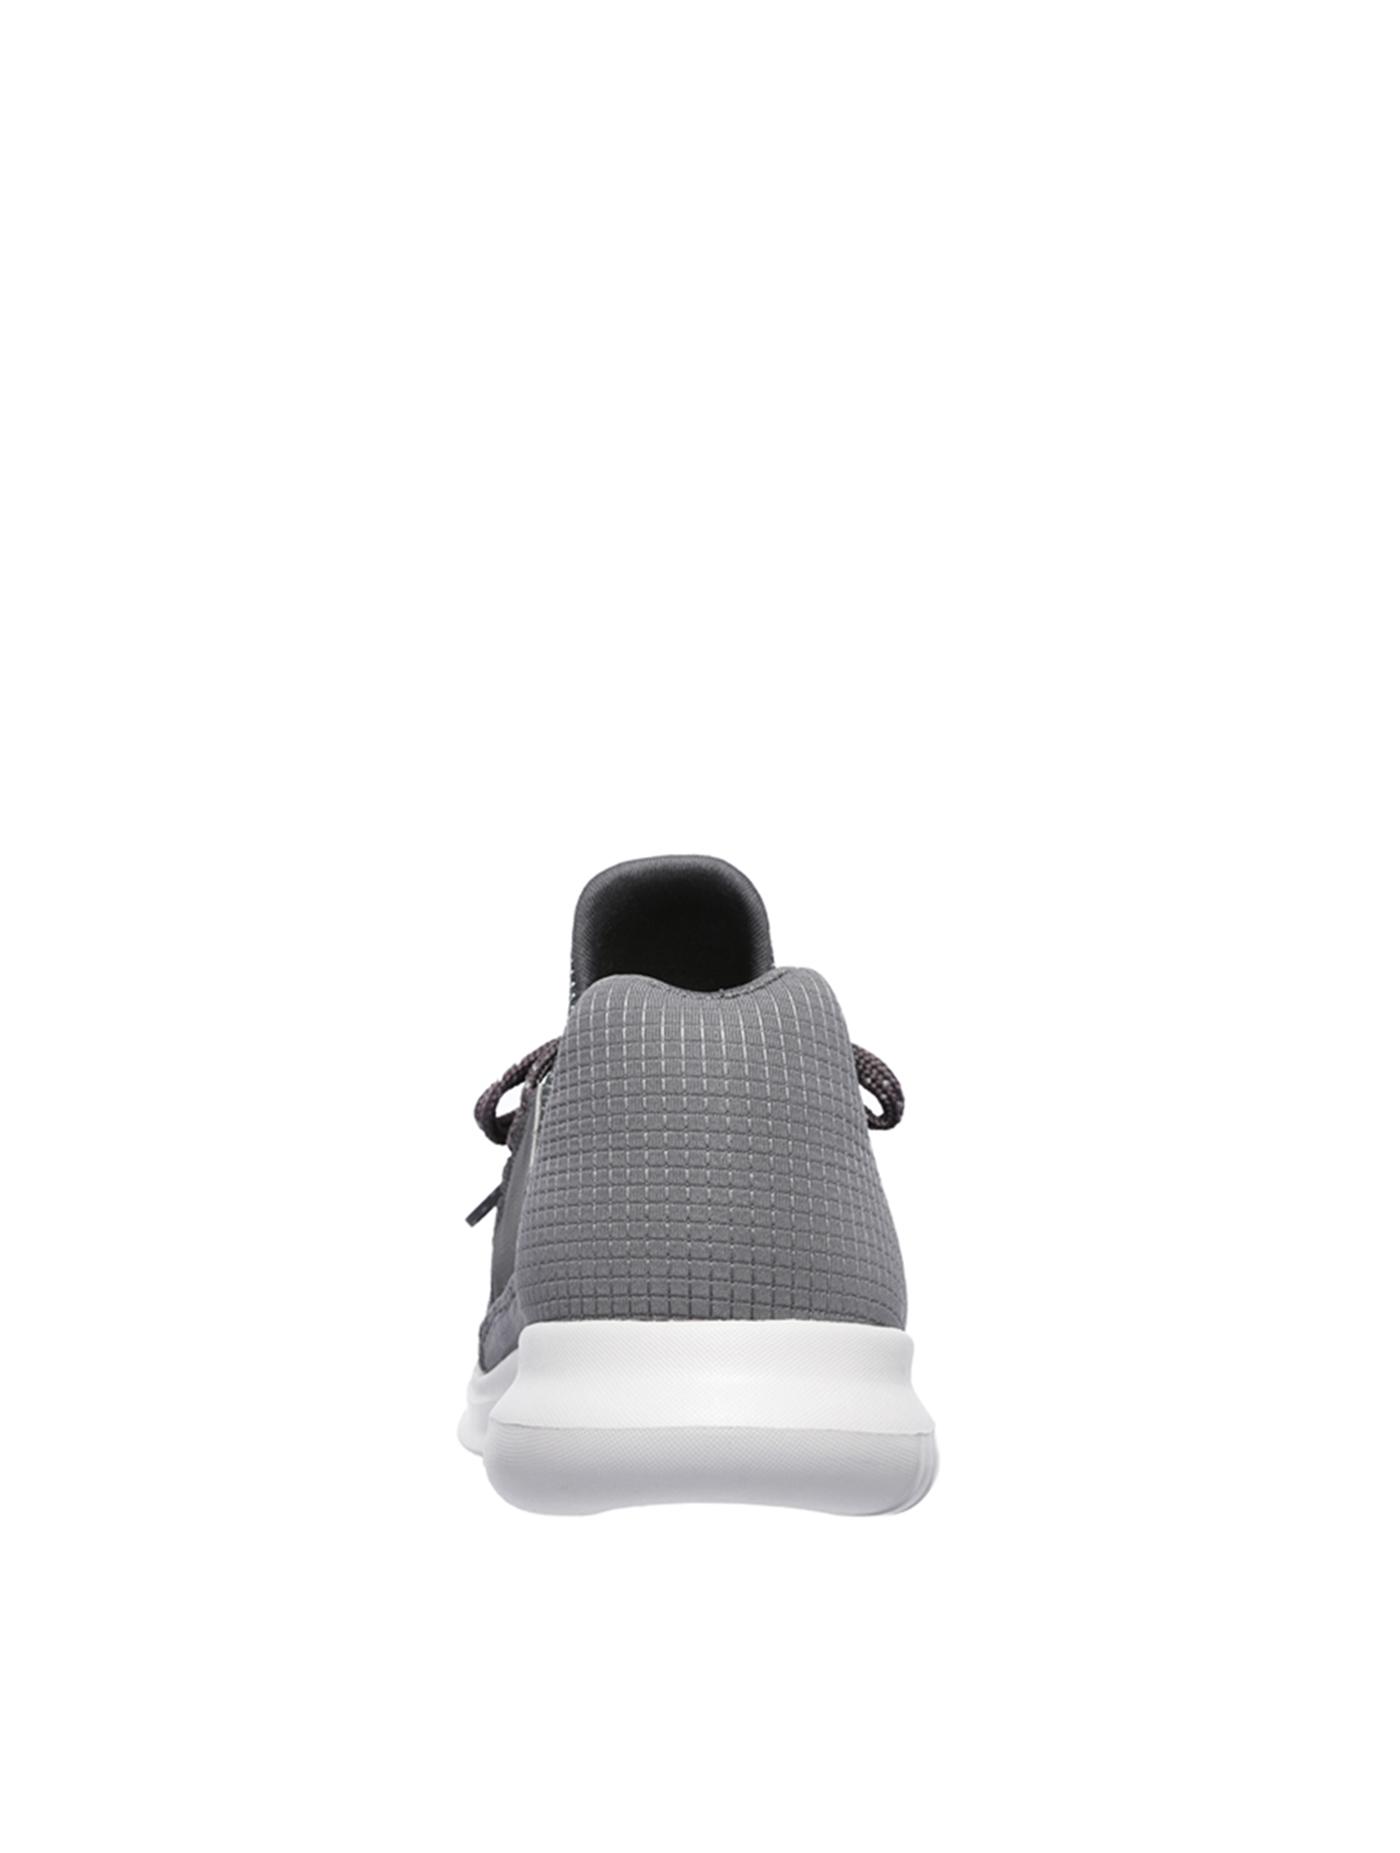 d4816f08db0a SKECHERS รองเท้าวิ่งผู้หญิง รุ่น Gorun Mojo - Verve FITGORMJ 14813 ไซส์ US5  สี Charcoal-